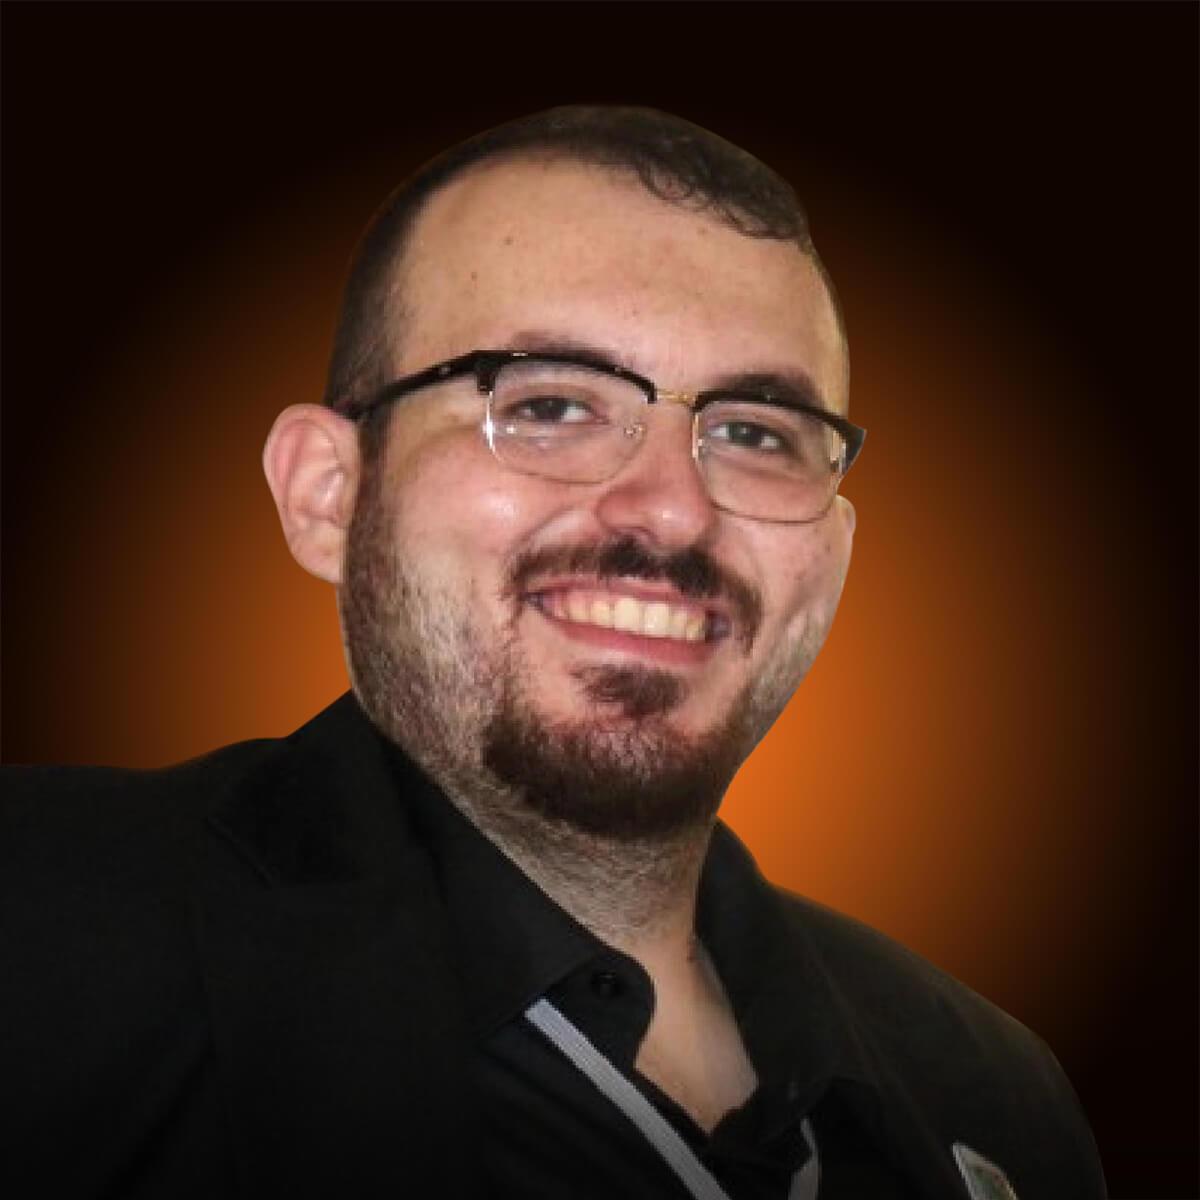 Mohammed Bassel Al-Madani